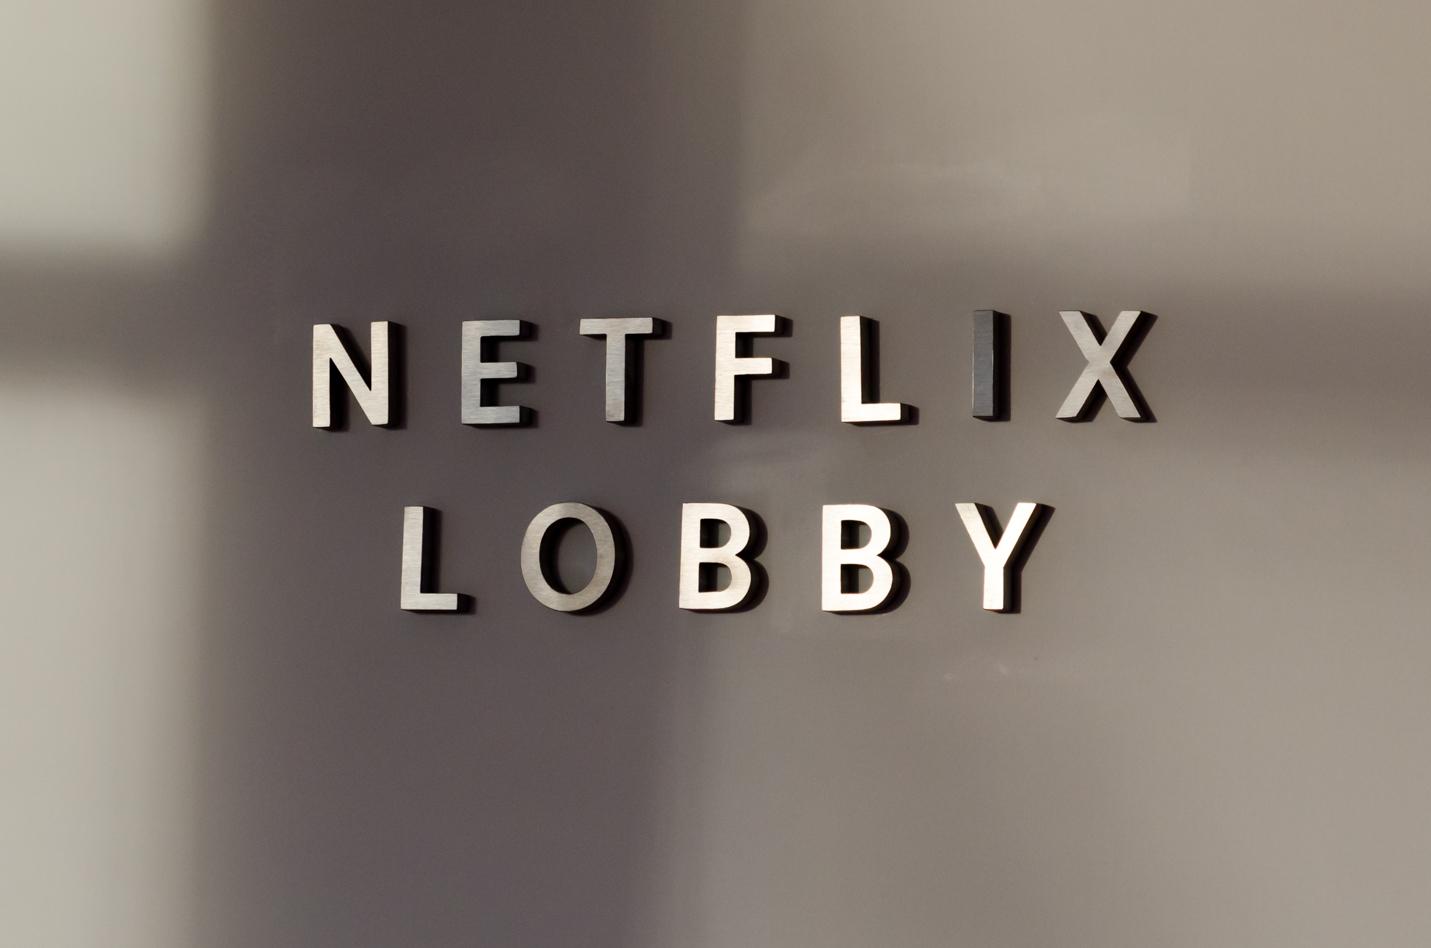 Television Academy_Netflix Lobby-1.jpg